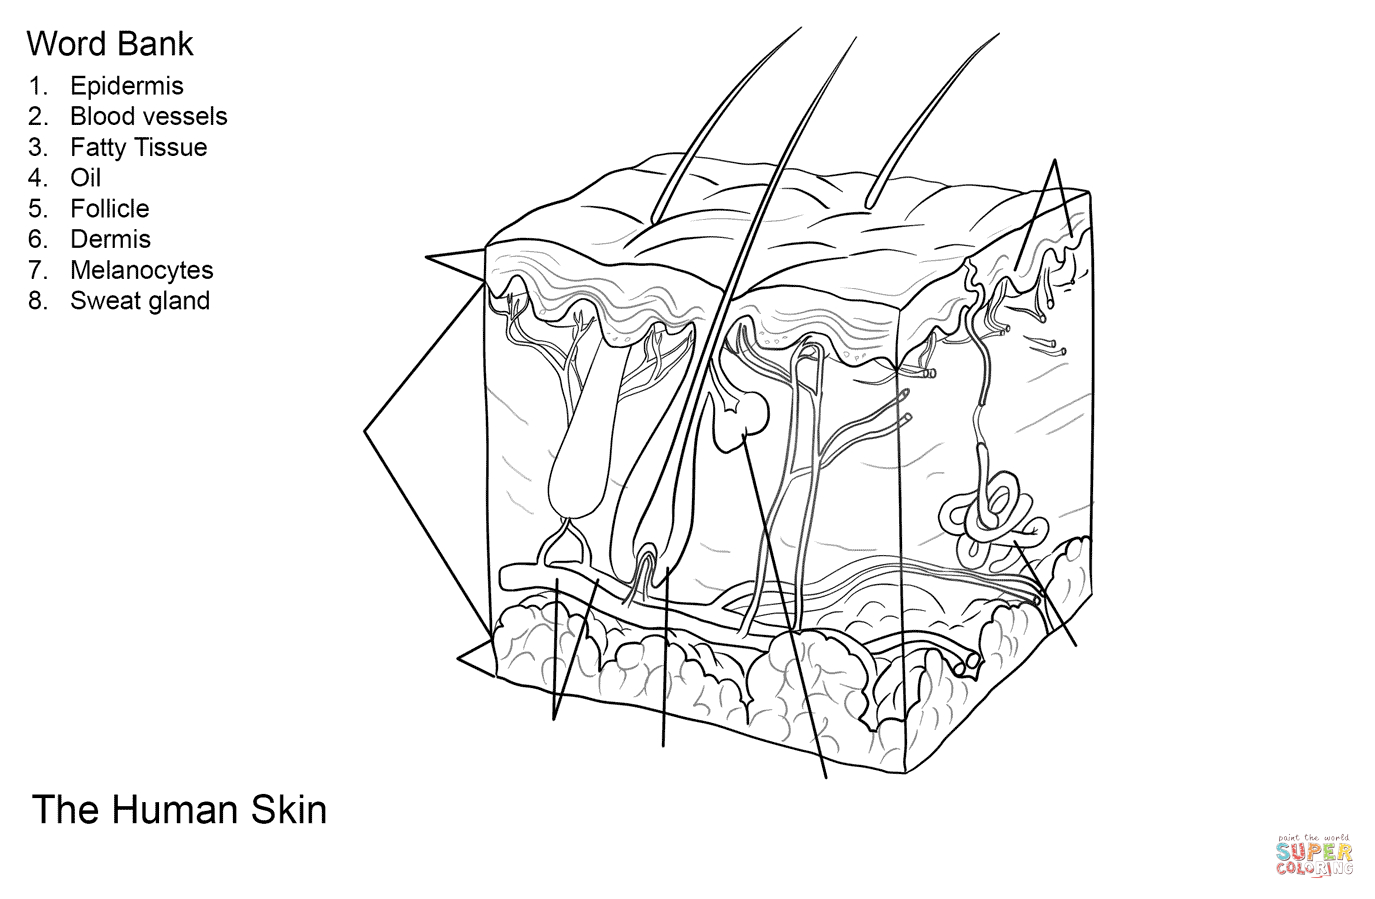 Human Skin Anatomy Worksheet Coloring Page  Free Printable Coloring For Skin Diagram Coloring And Labeling Worksheet